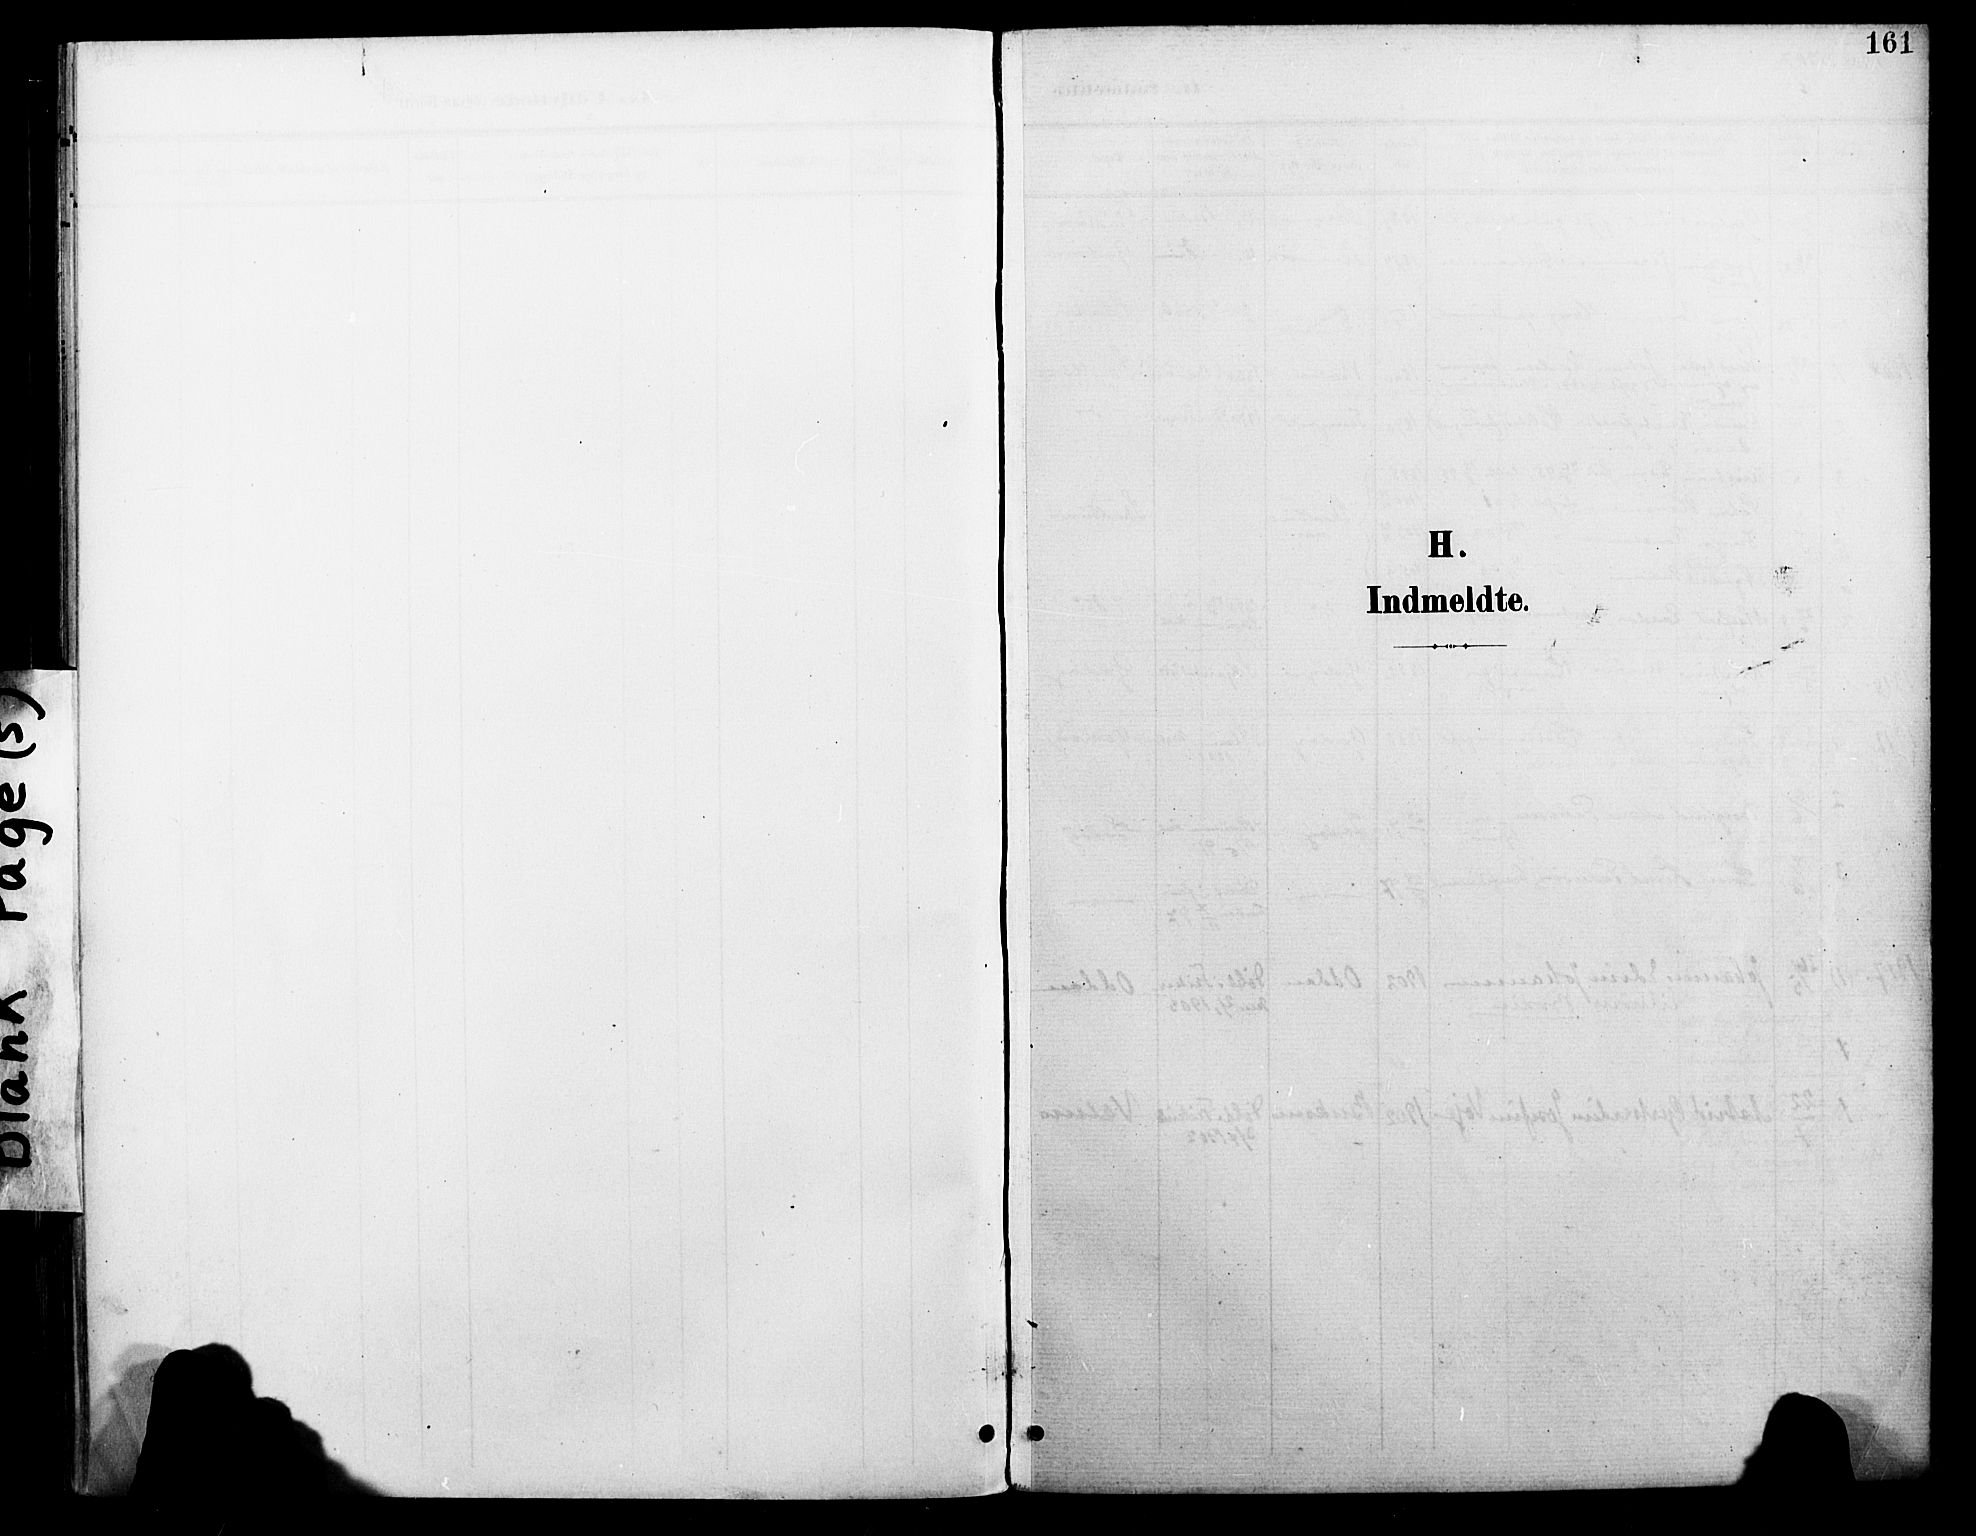 SAT, Ministerialprotokoller, klokkerbøker og fødselsregistre - Nordland, 804/L0088: Klokkerbok nr. 804C01, 1901-1917, s. 161